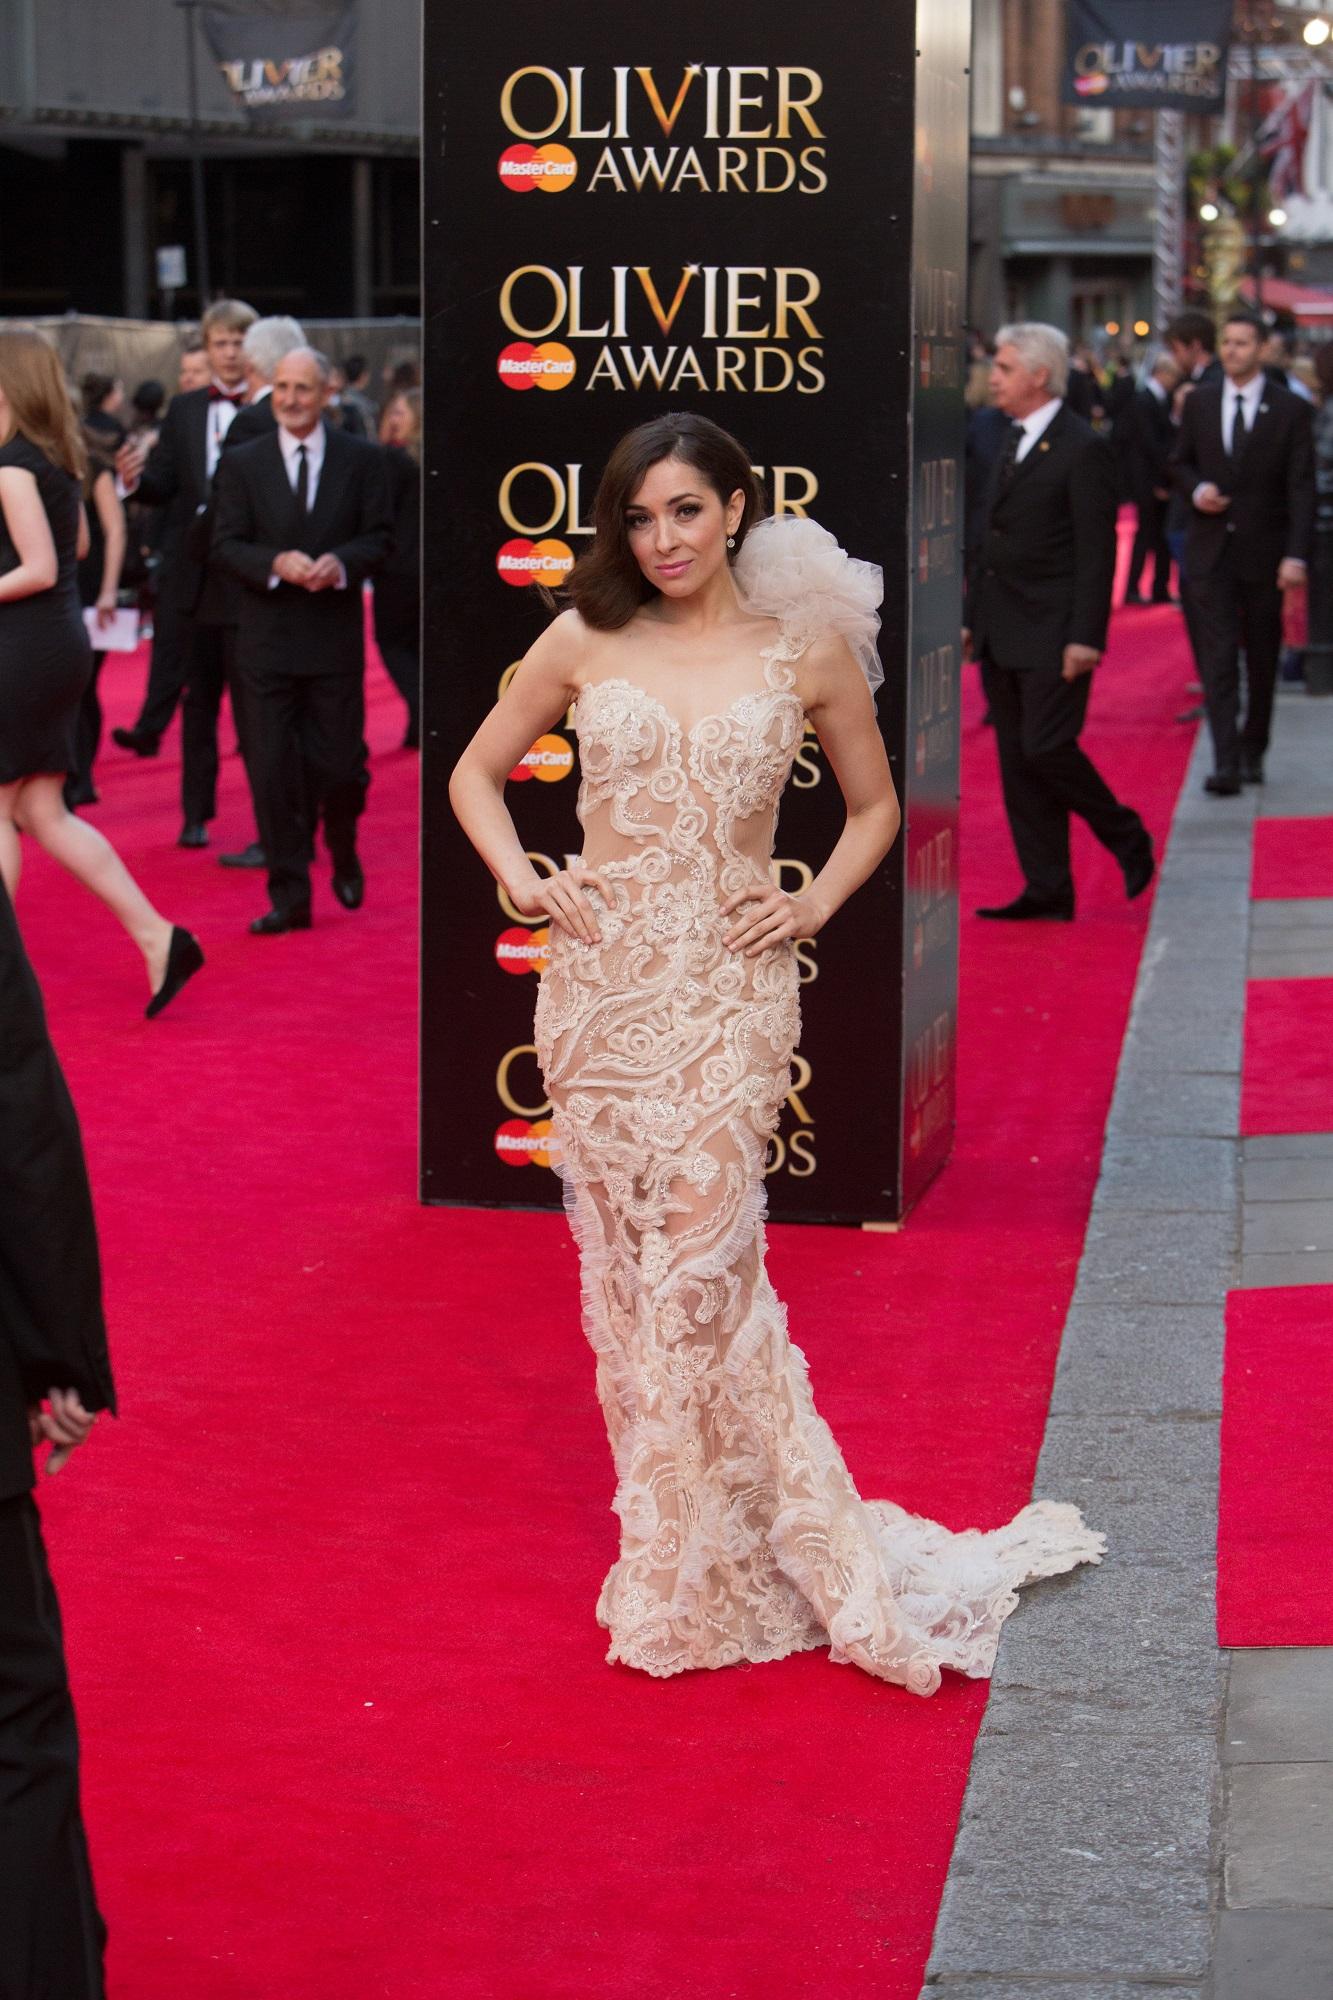 Olivier Awards 2014, London 13042014 Zrinka Cvitesic snimio Petar Jurica